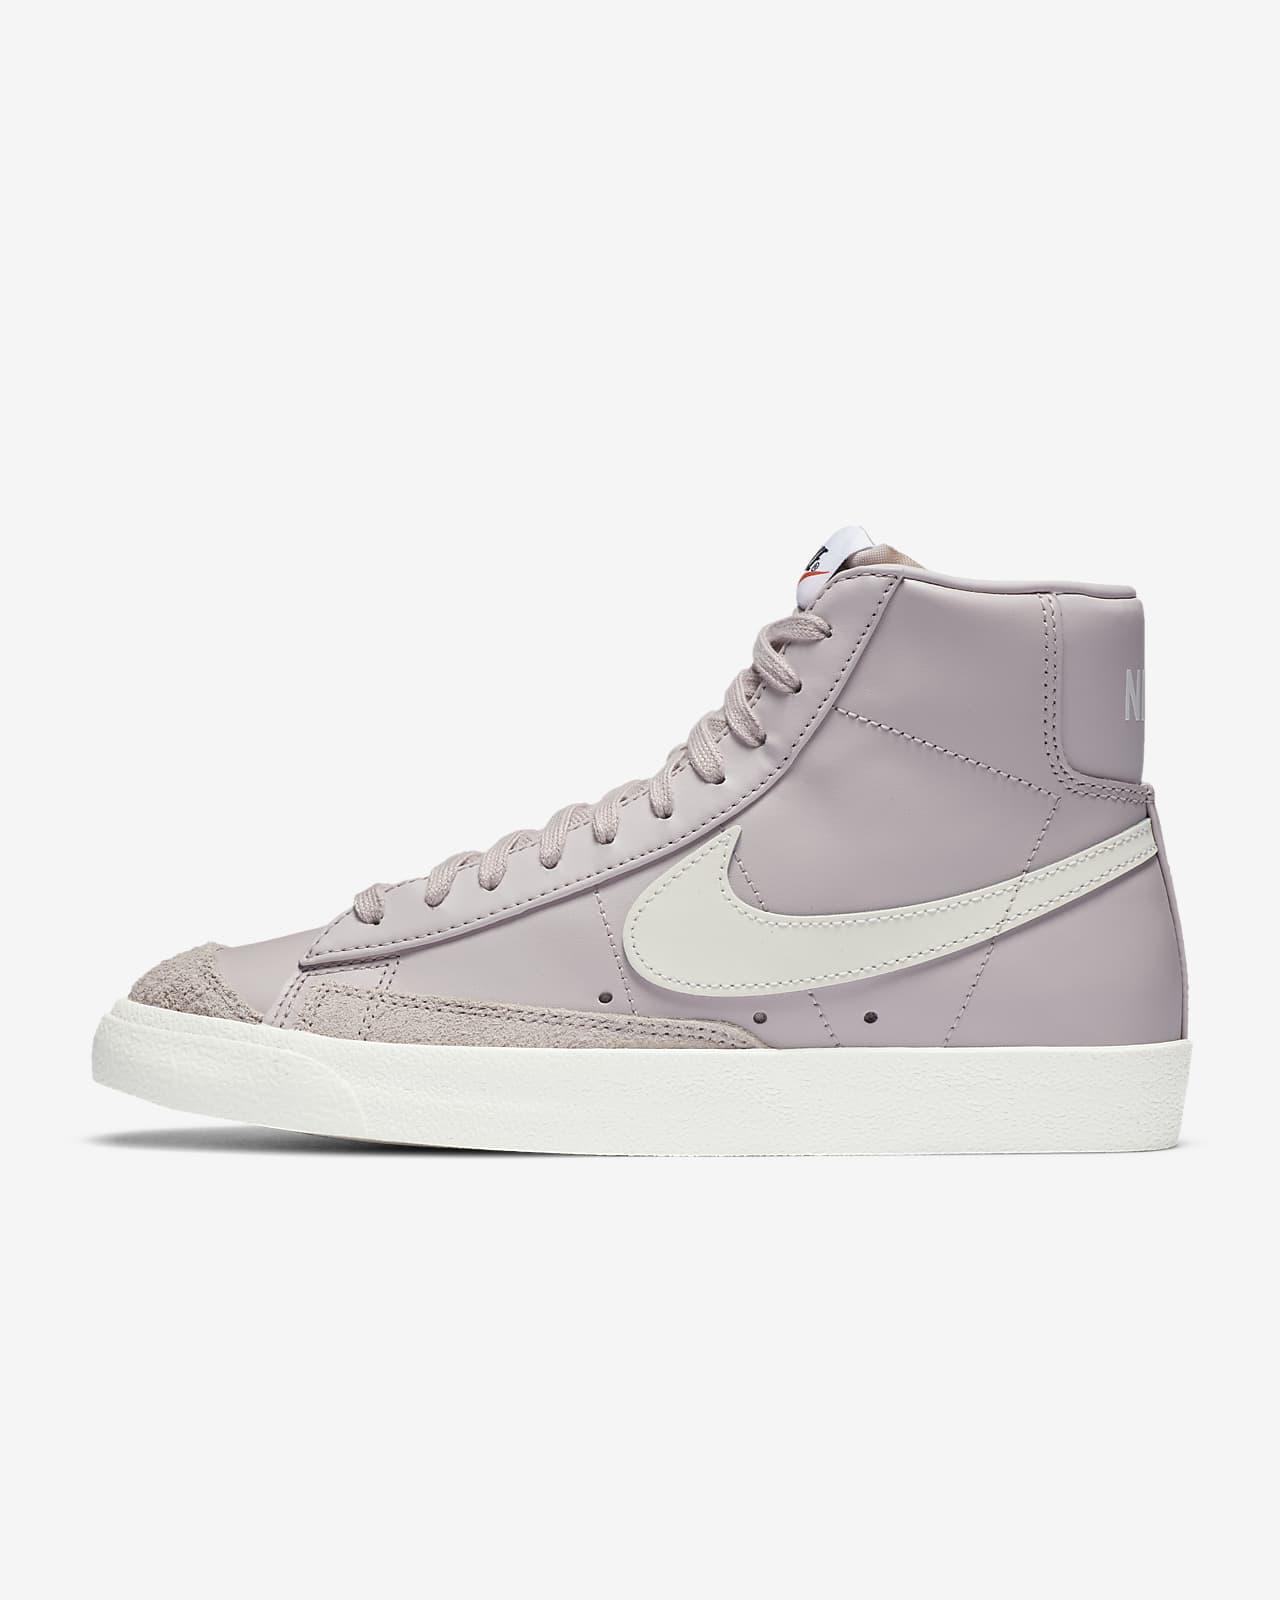 Calzado para mujer Nike Blazer Mid 77 Vintage